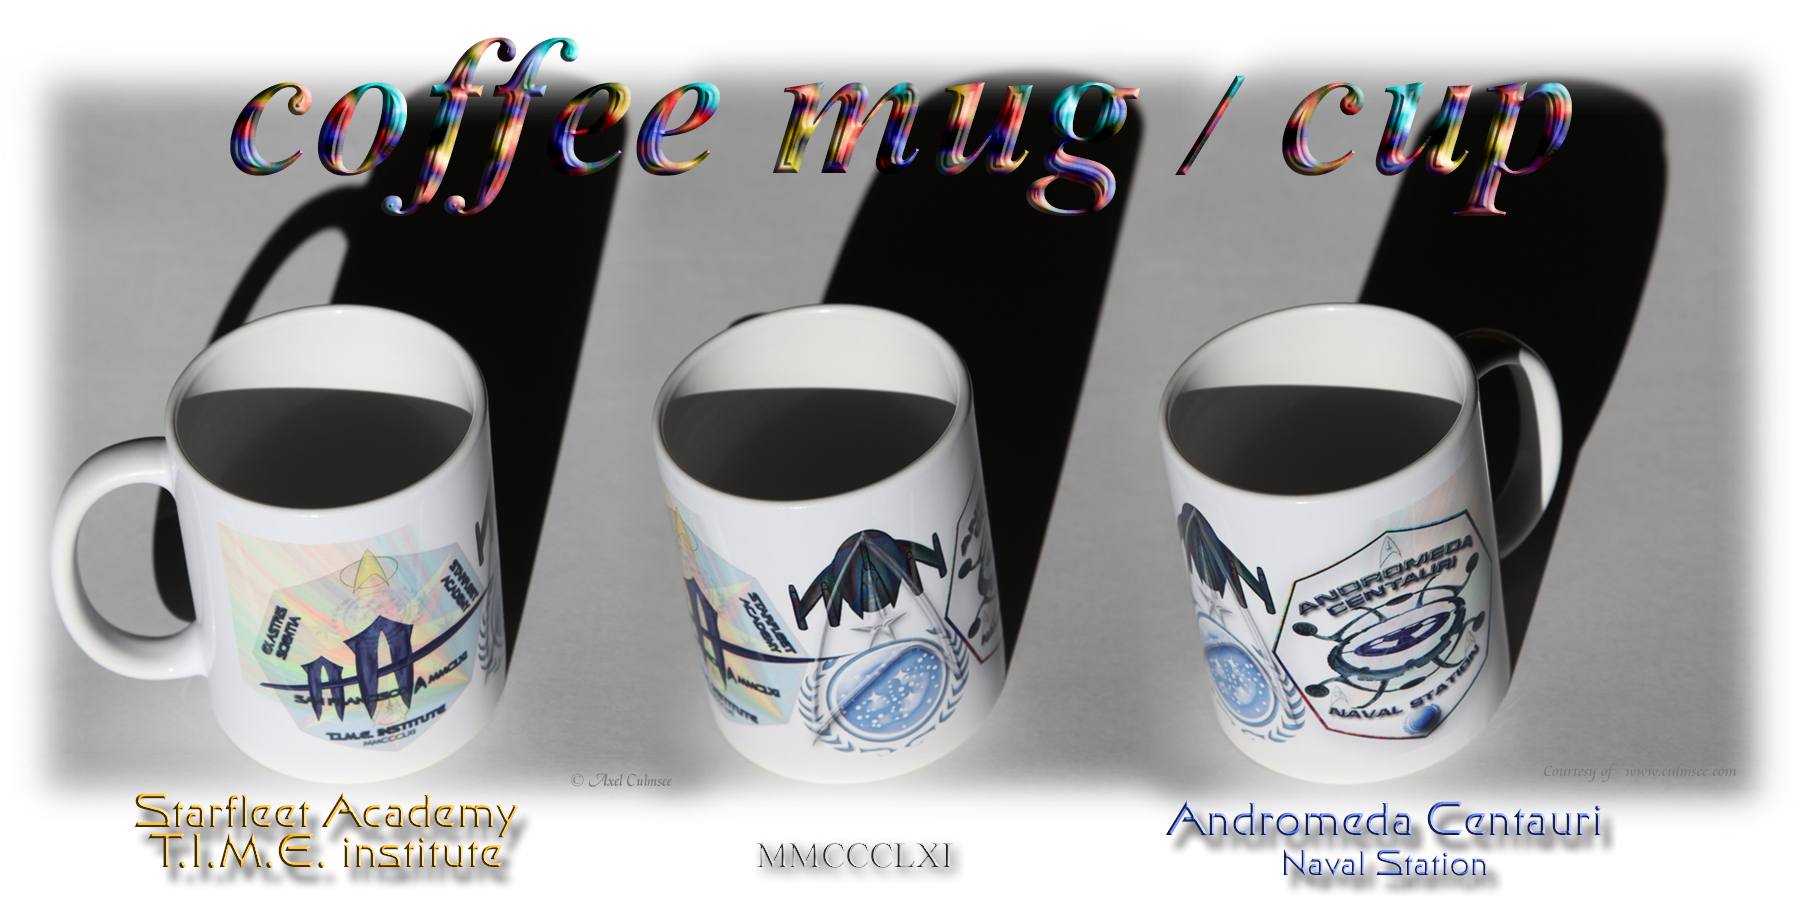 coffee mug cup Starfleet Academy Andromeda Centauri naval station